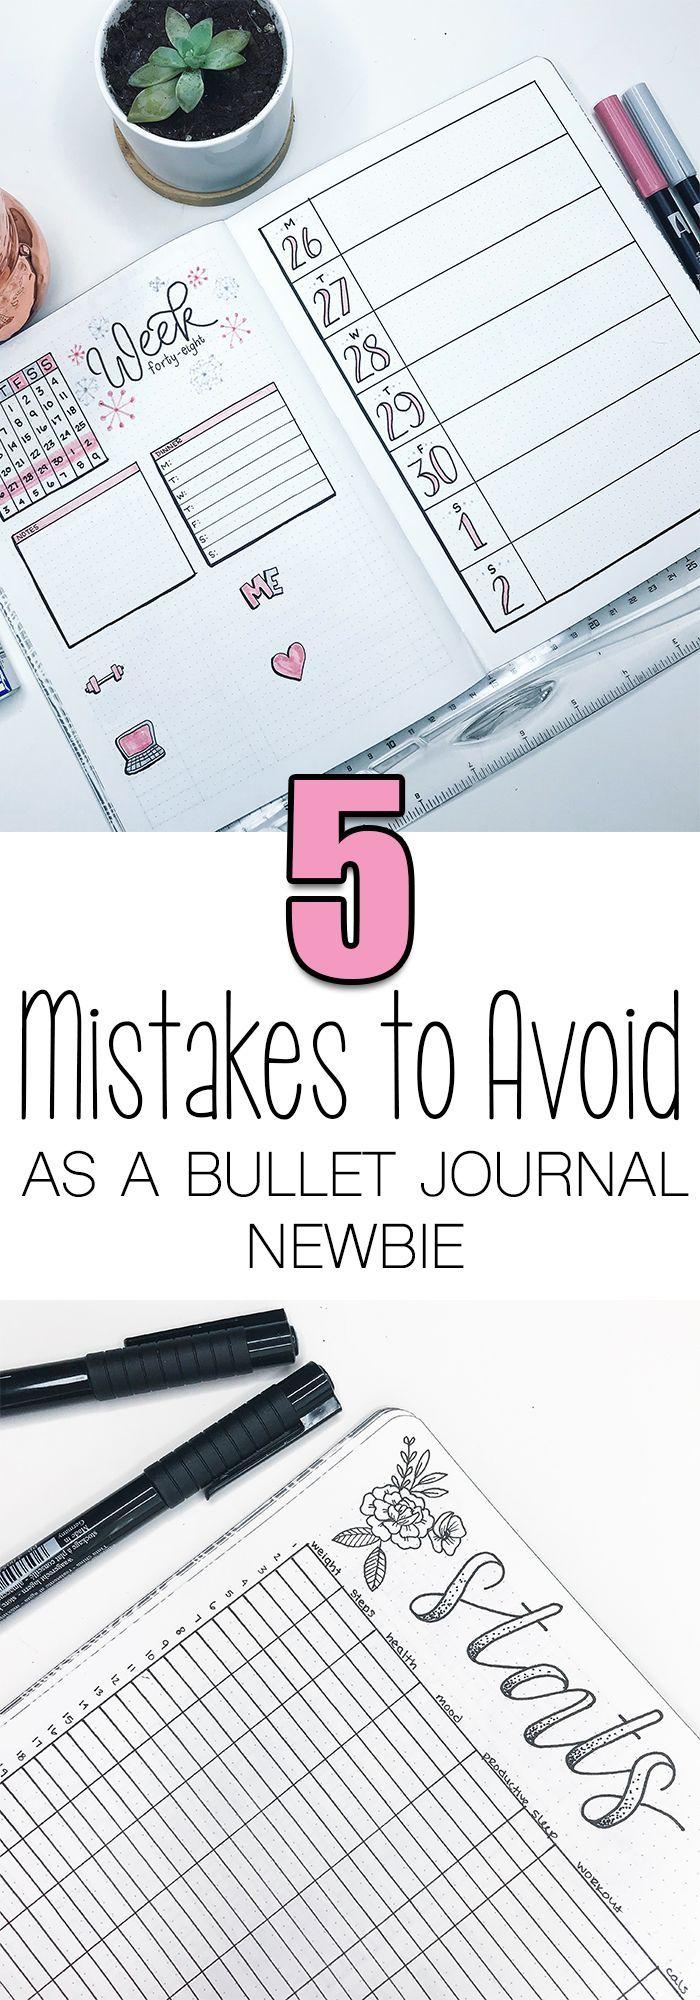 Top 5 Bullet Journal Mistakes 'Newbies' Make